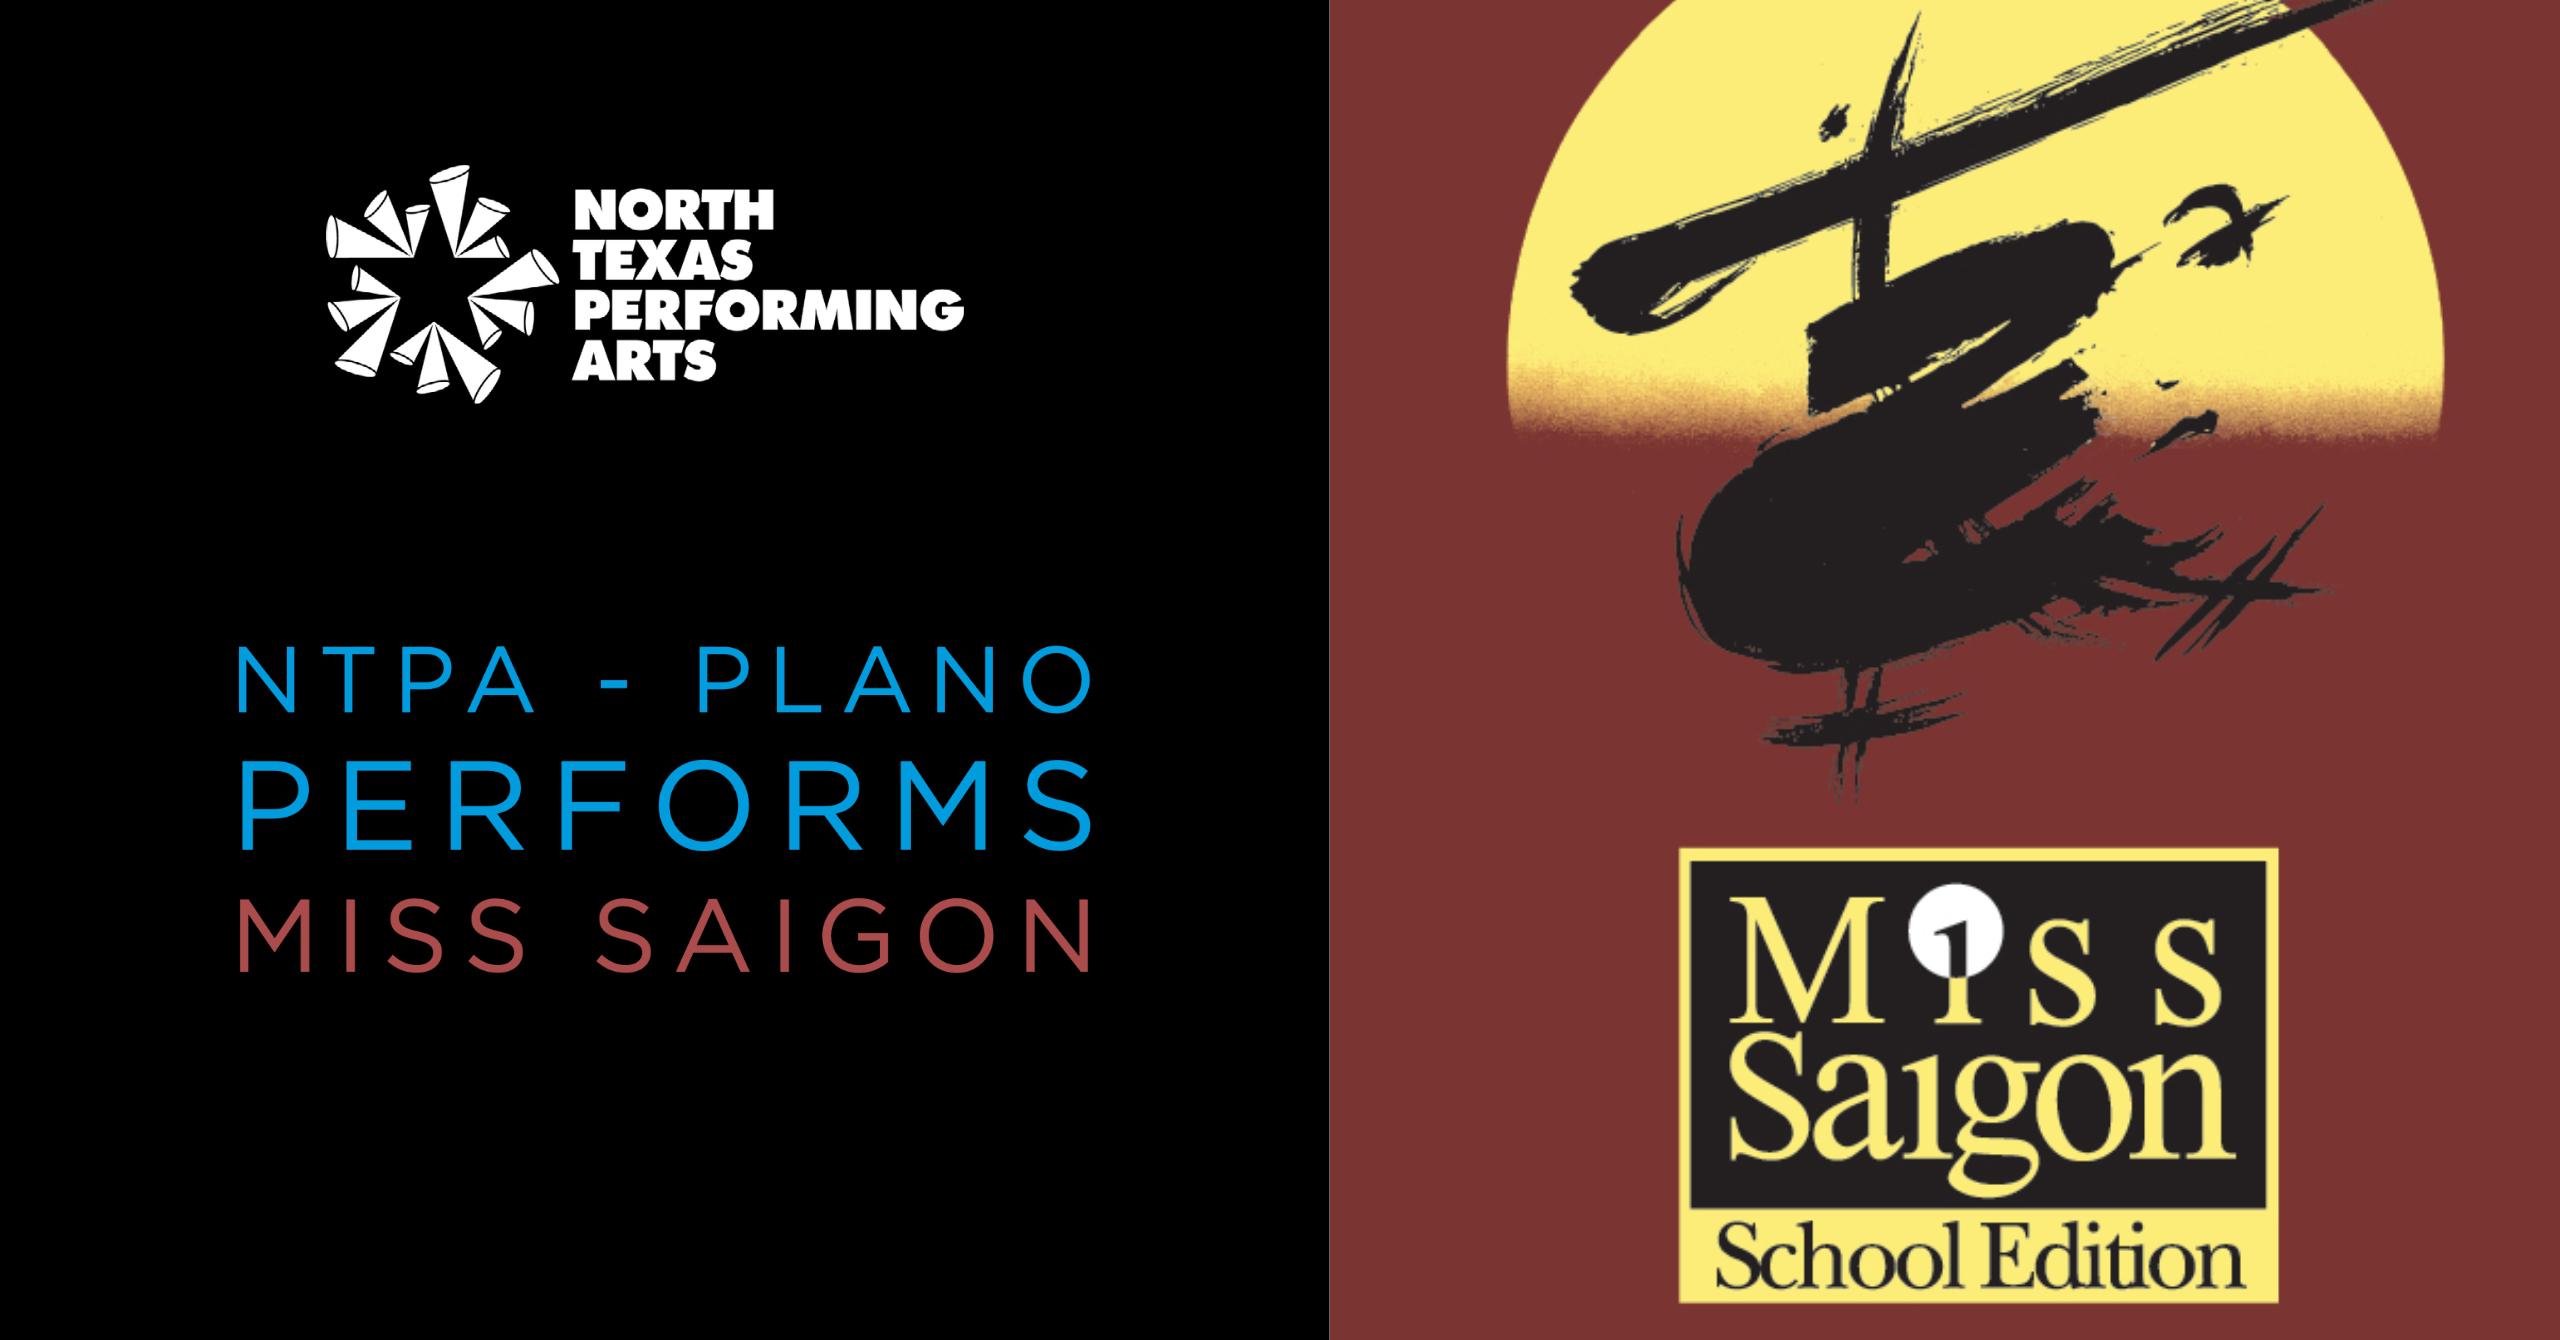 NTPA Plano performs Miss Saigon cover photo blog article